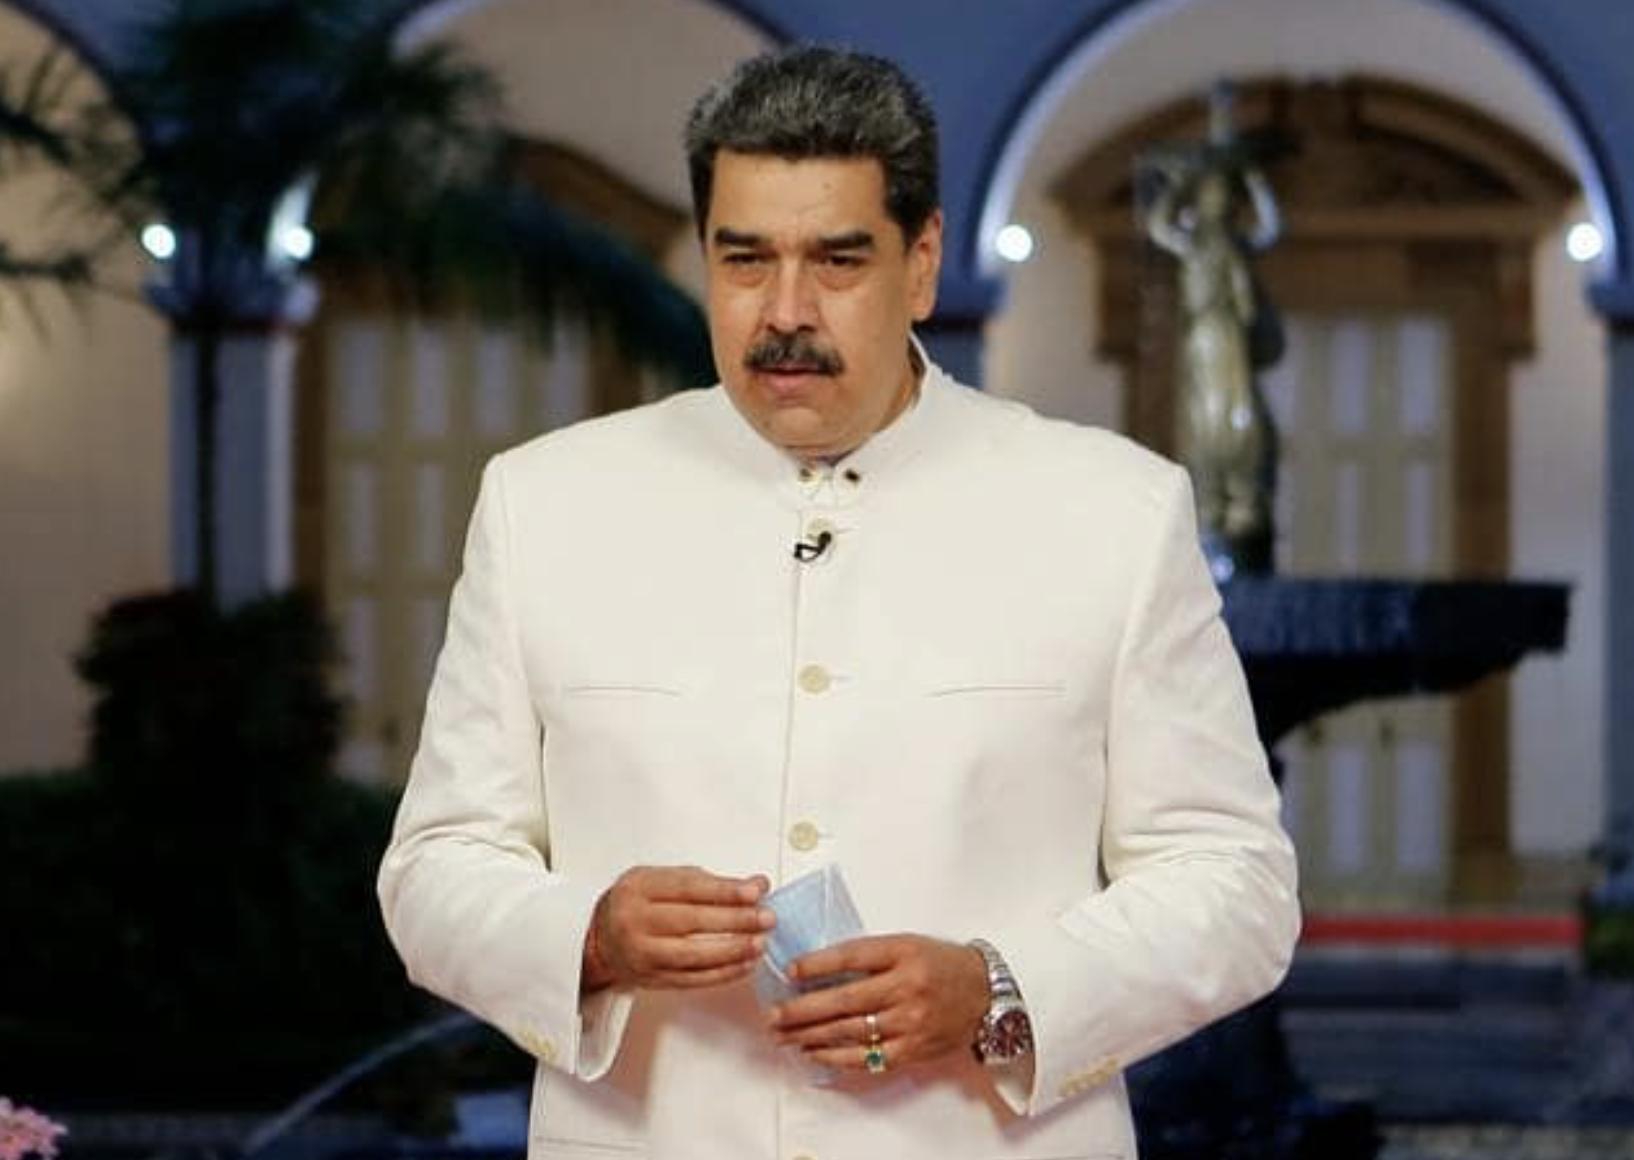 Venezuela: Socialism's new launching point to destabilize the U.S.